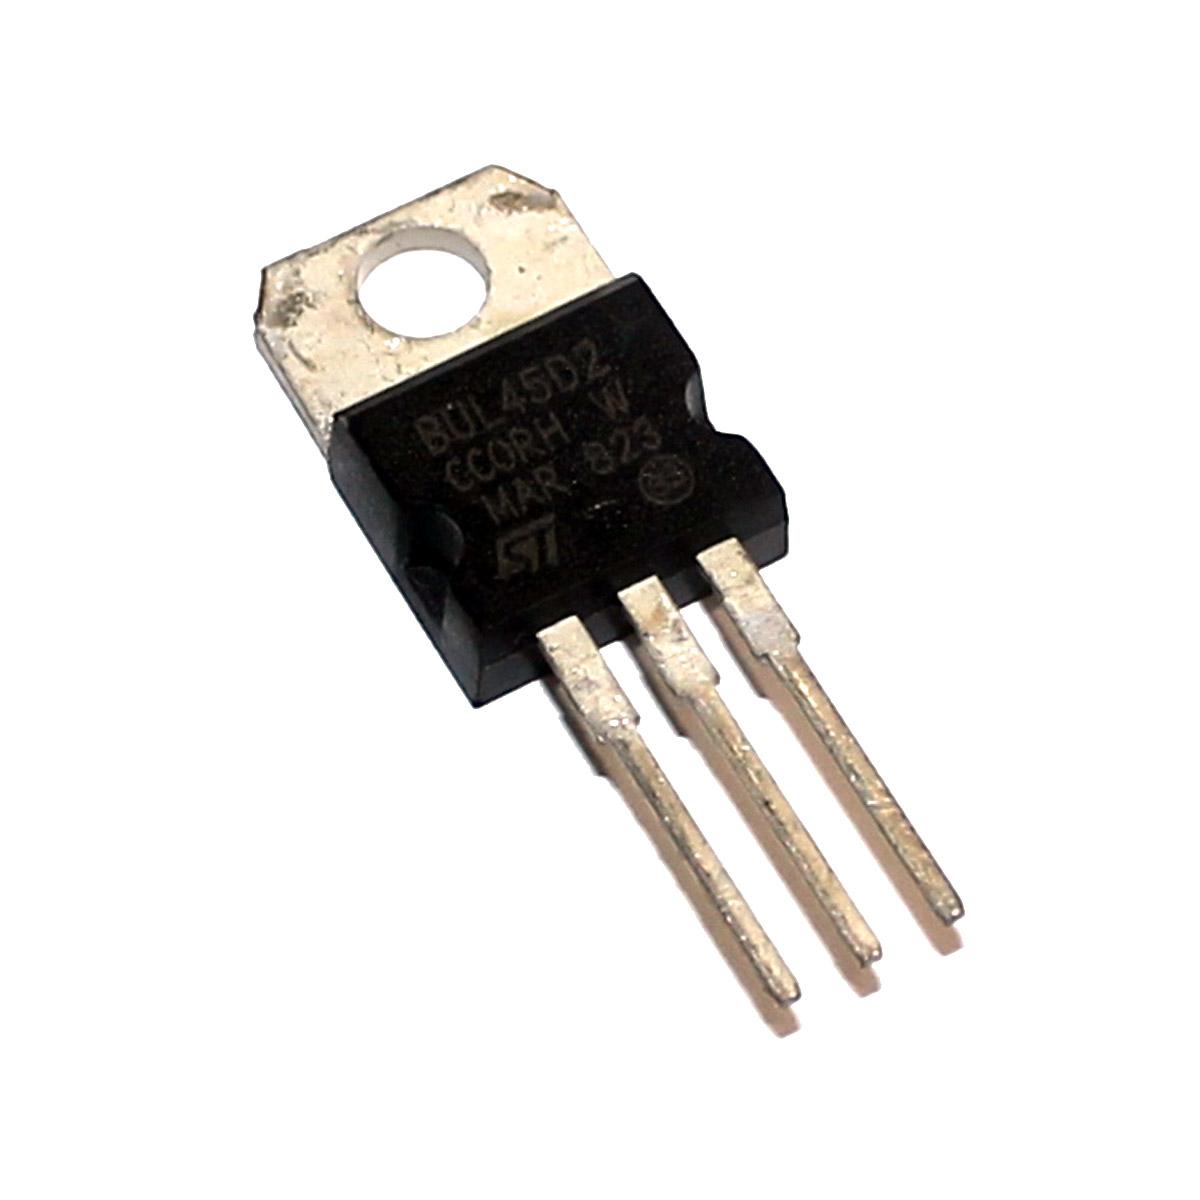 KSC 5338D Transistor KSC5338D